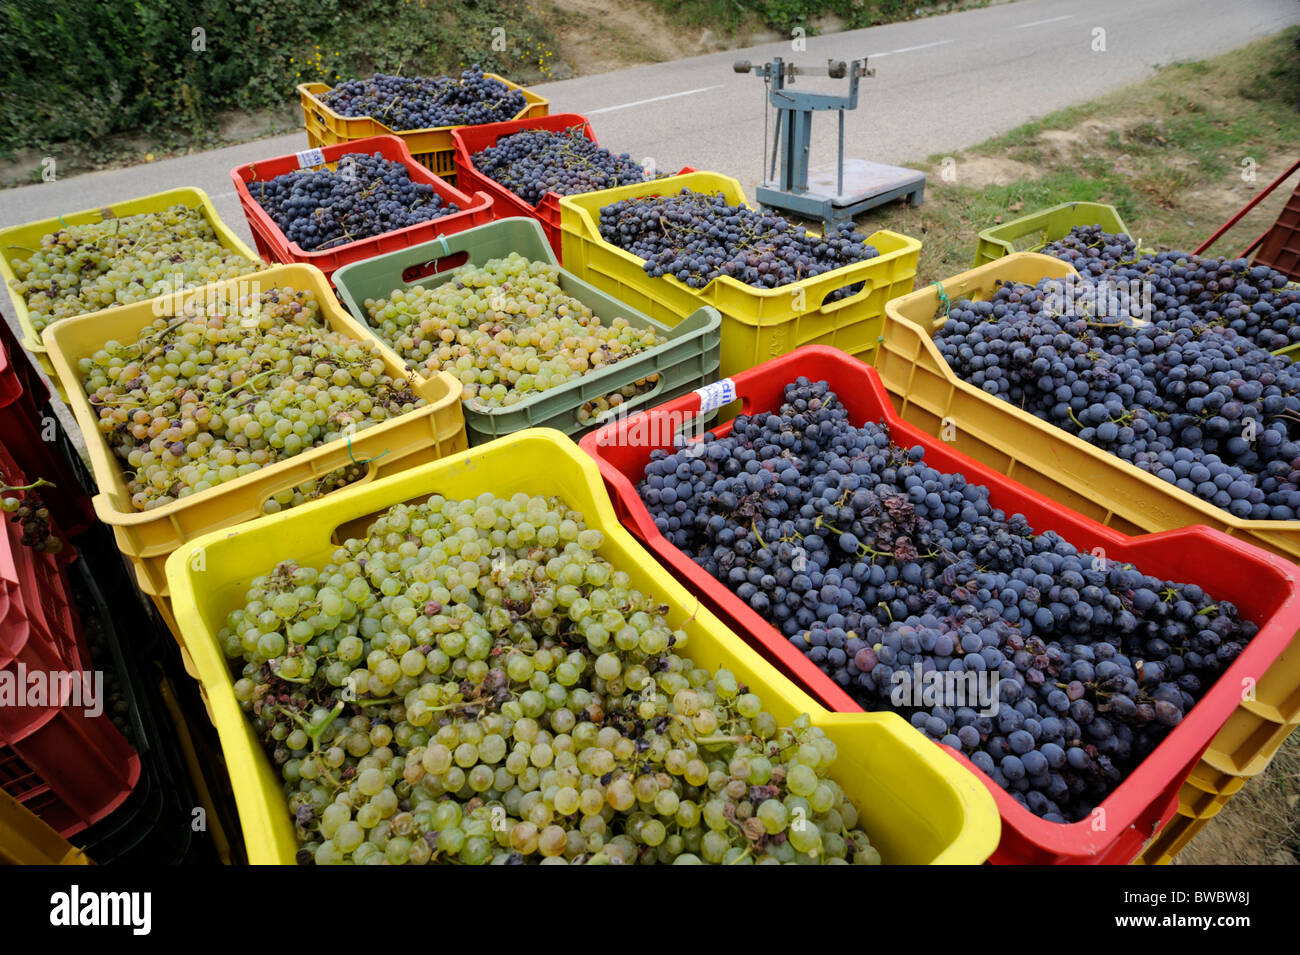 italy, basilicata, grape harvest - Stock Image